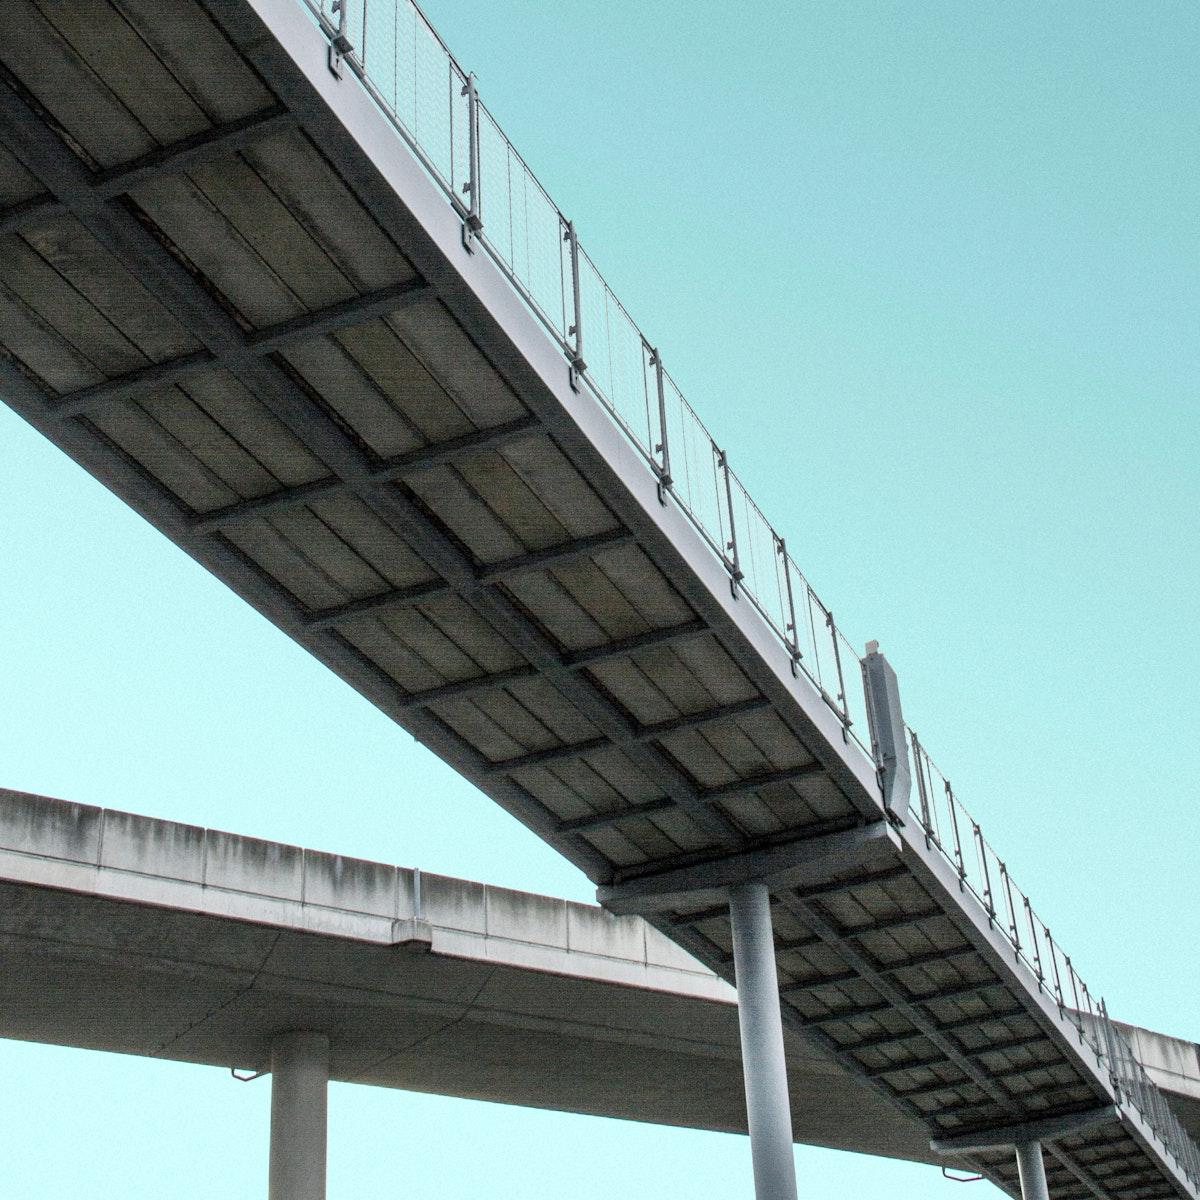 Bridge at Heathrow Airport, Terminal 5